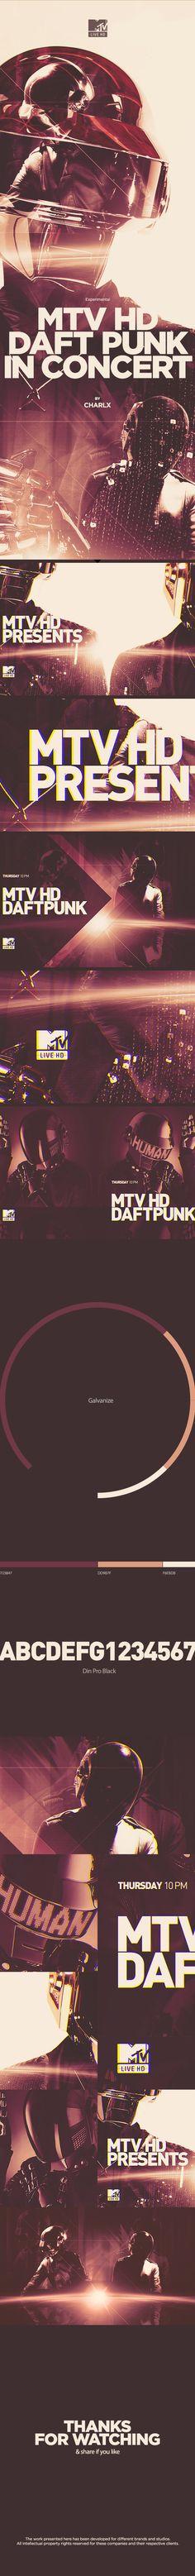 MTV HD | DAFT PUNK